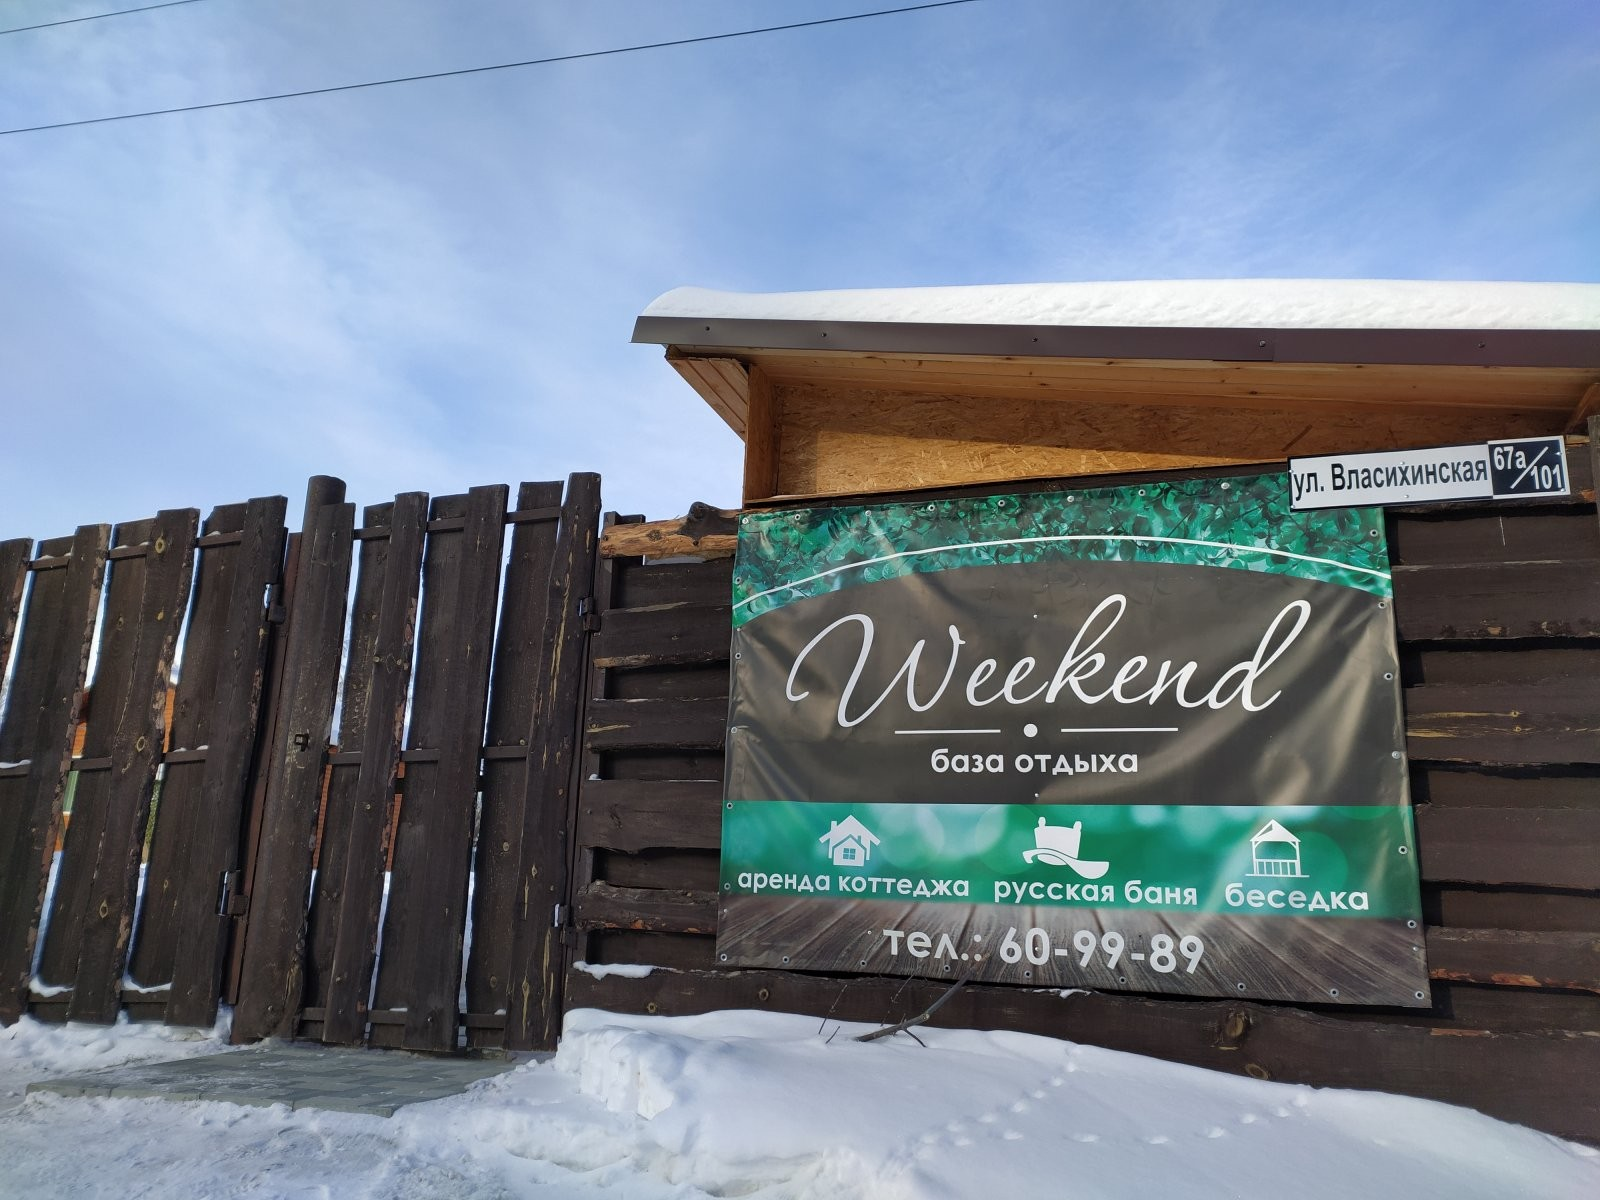 Weekend, база отдыха - №2